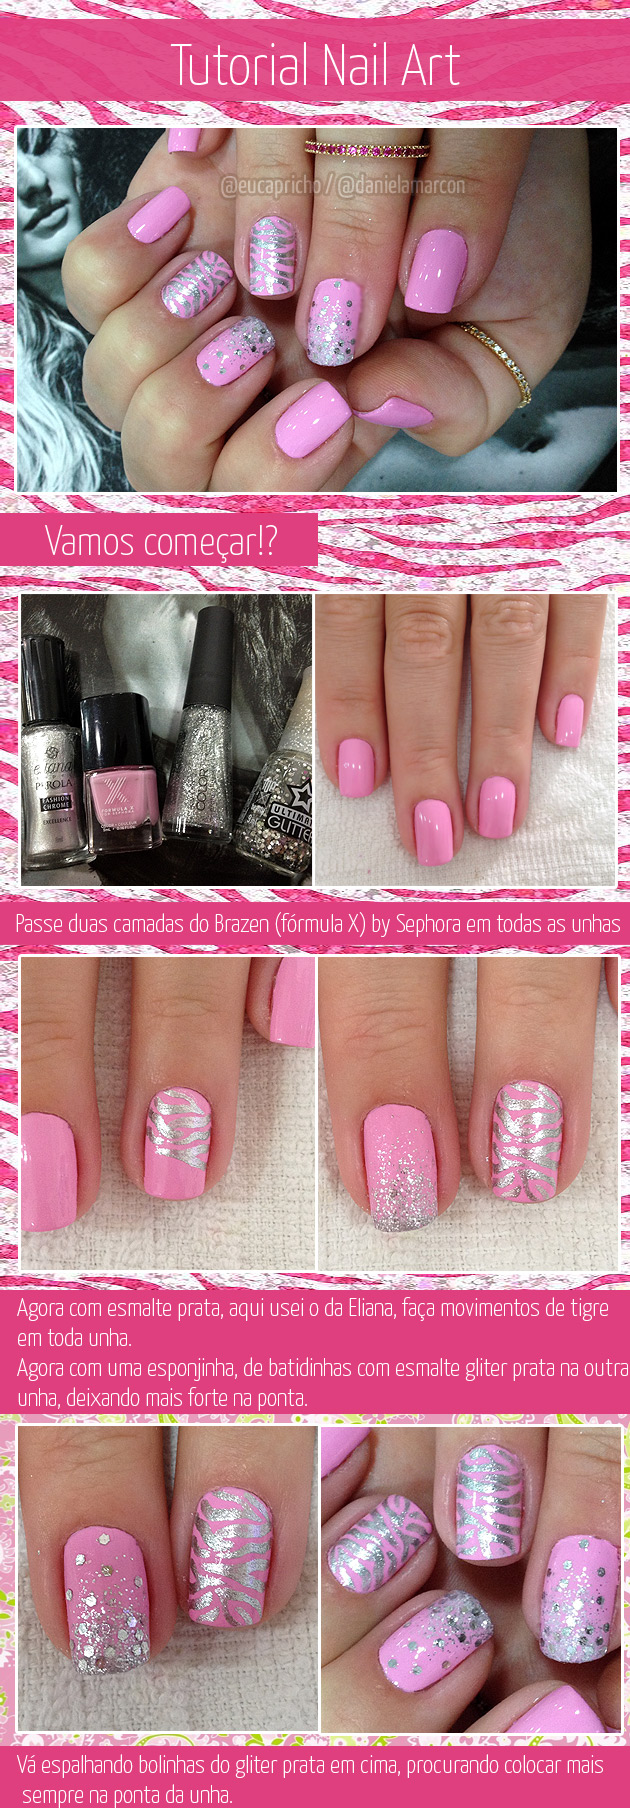 Unha Decorada Tutorial zebra - unha decorada rosa com glitter e brilho